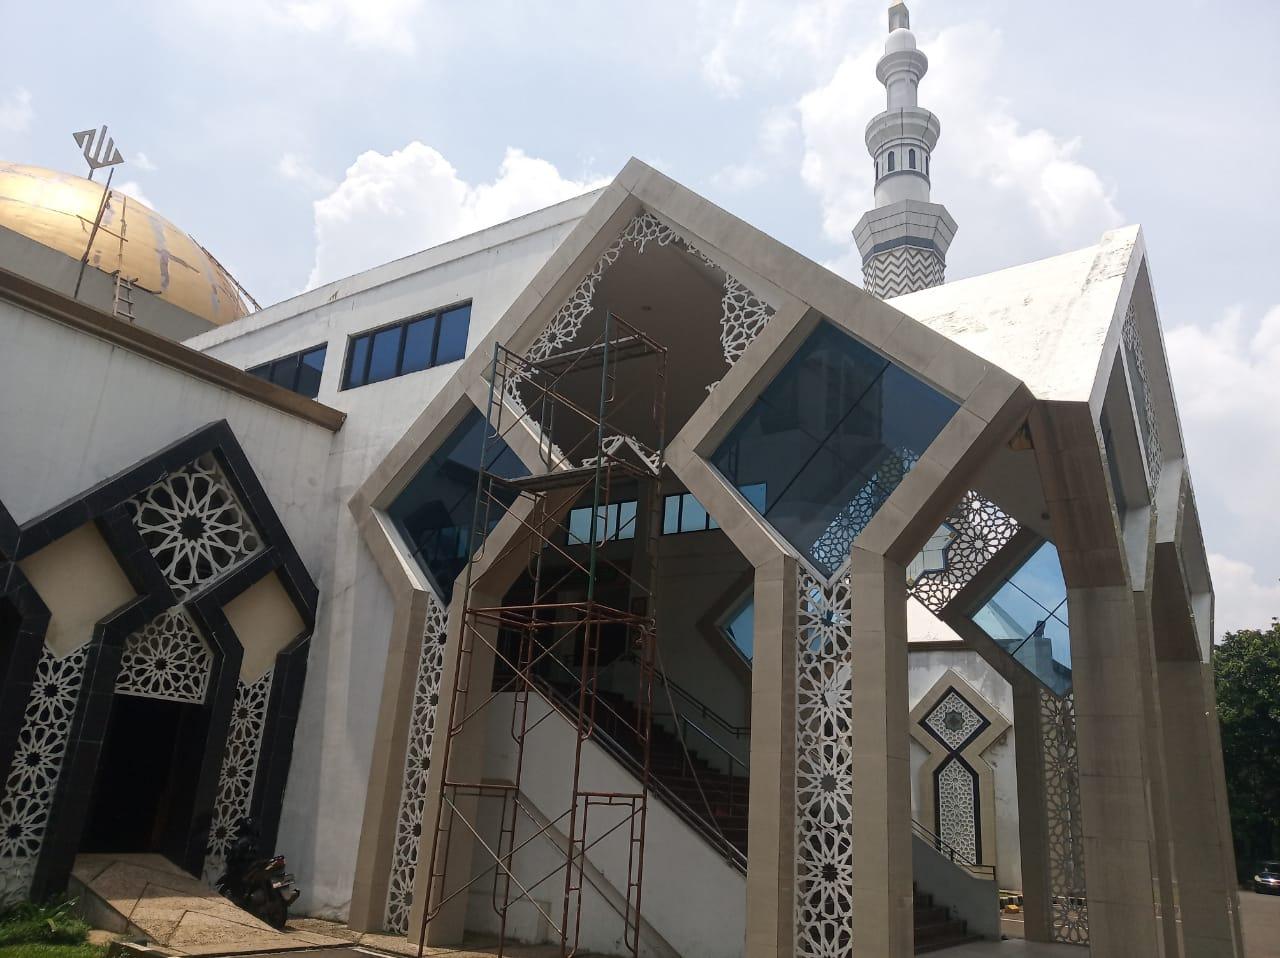 Rehabilitasi Bangunan Masjid Baitul Faidzin Dipertanyakan, Kajari Kabupaten Bogor Siapkan Pasukan